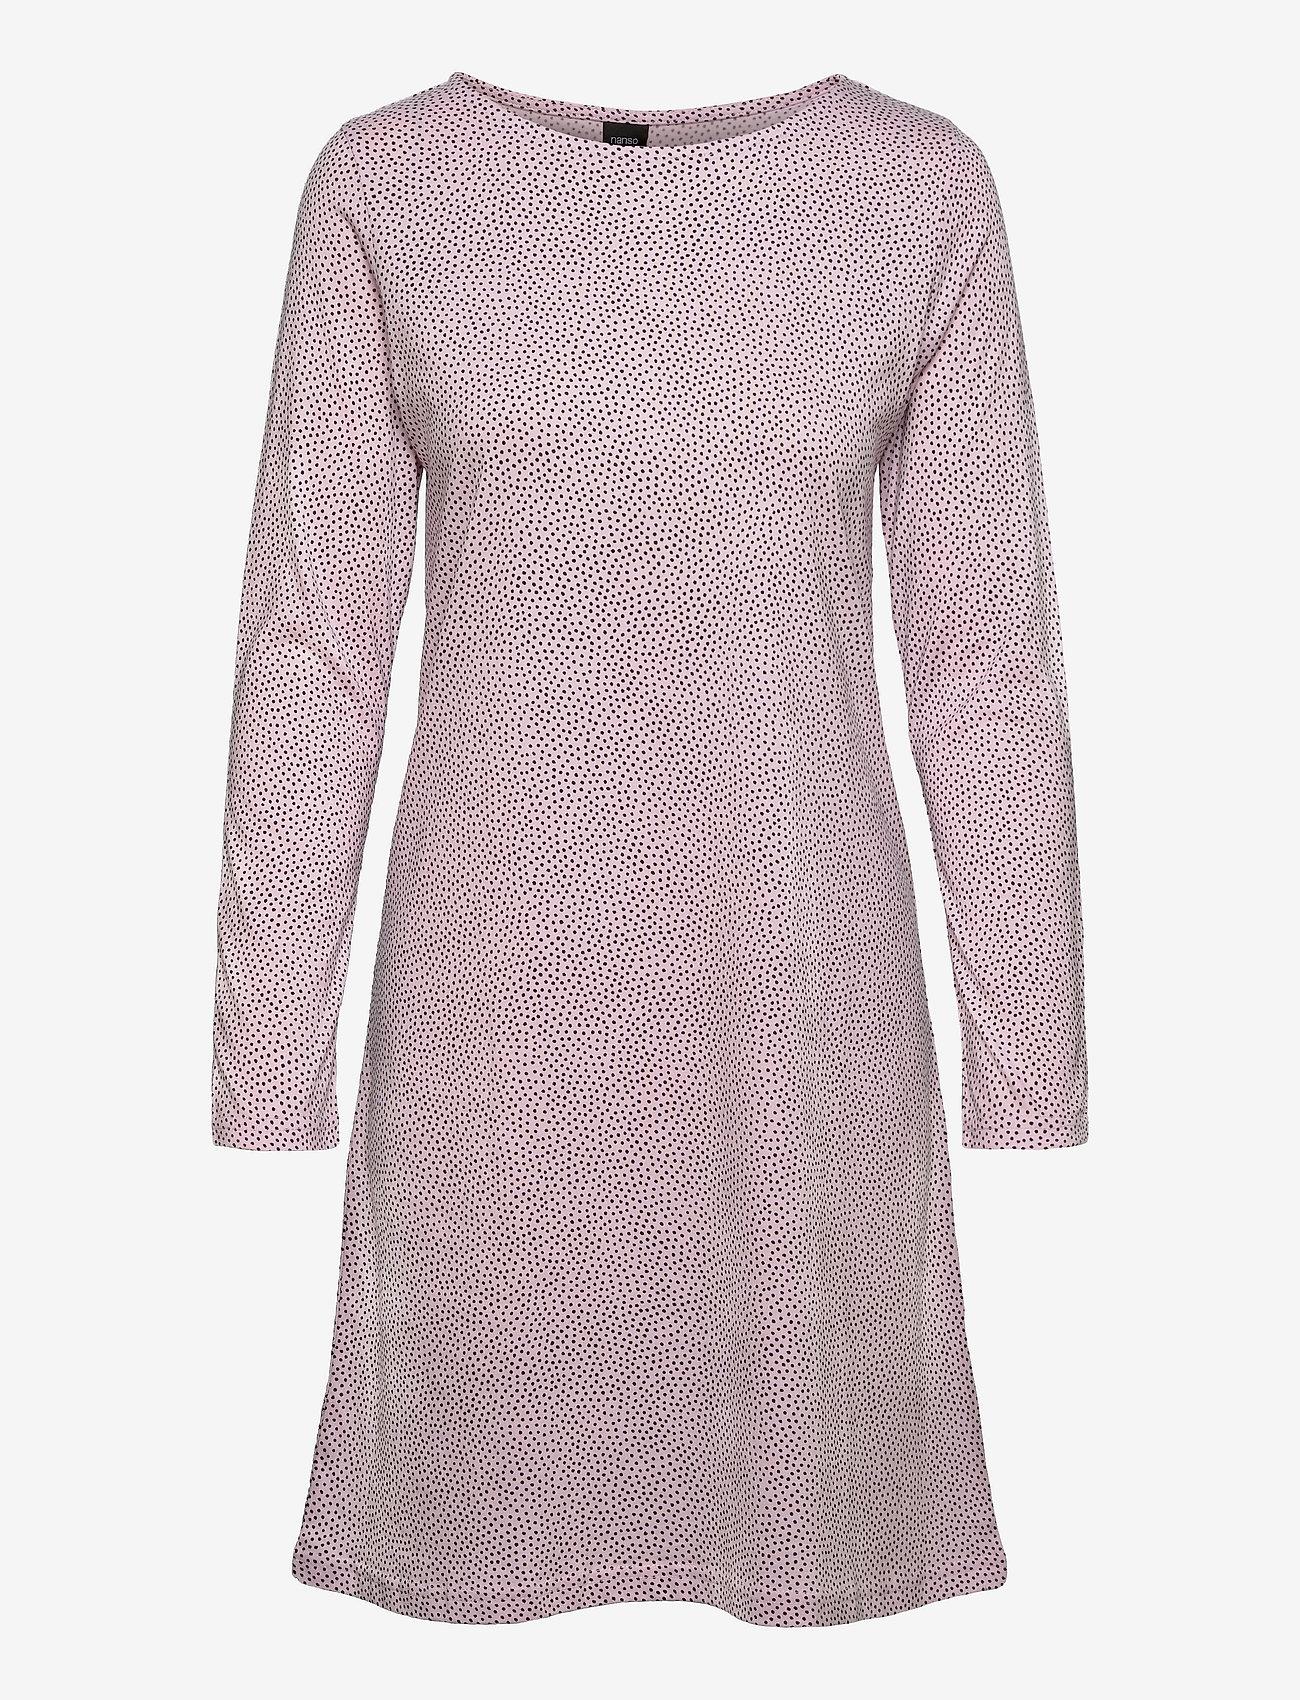 Nanso - Ladies big shirt, Pilkut - midimekot - light pink - 0